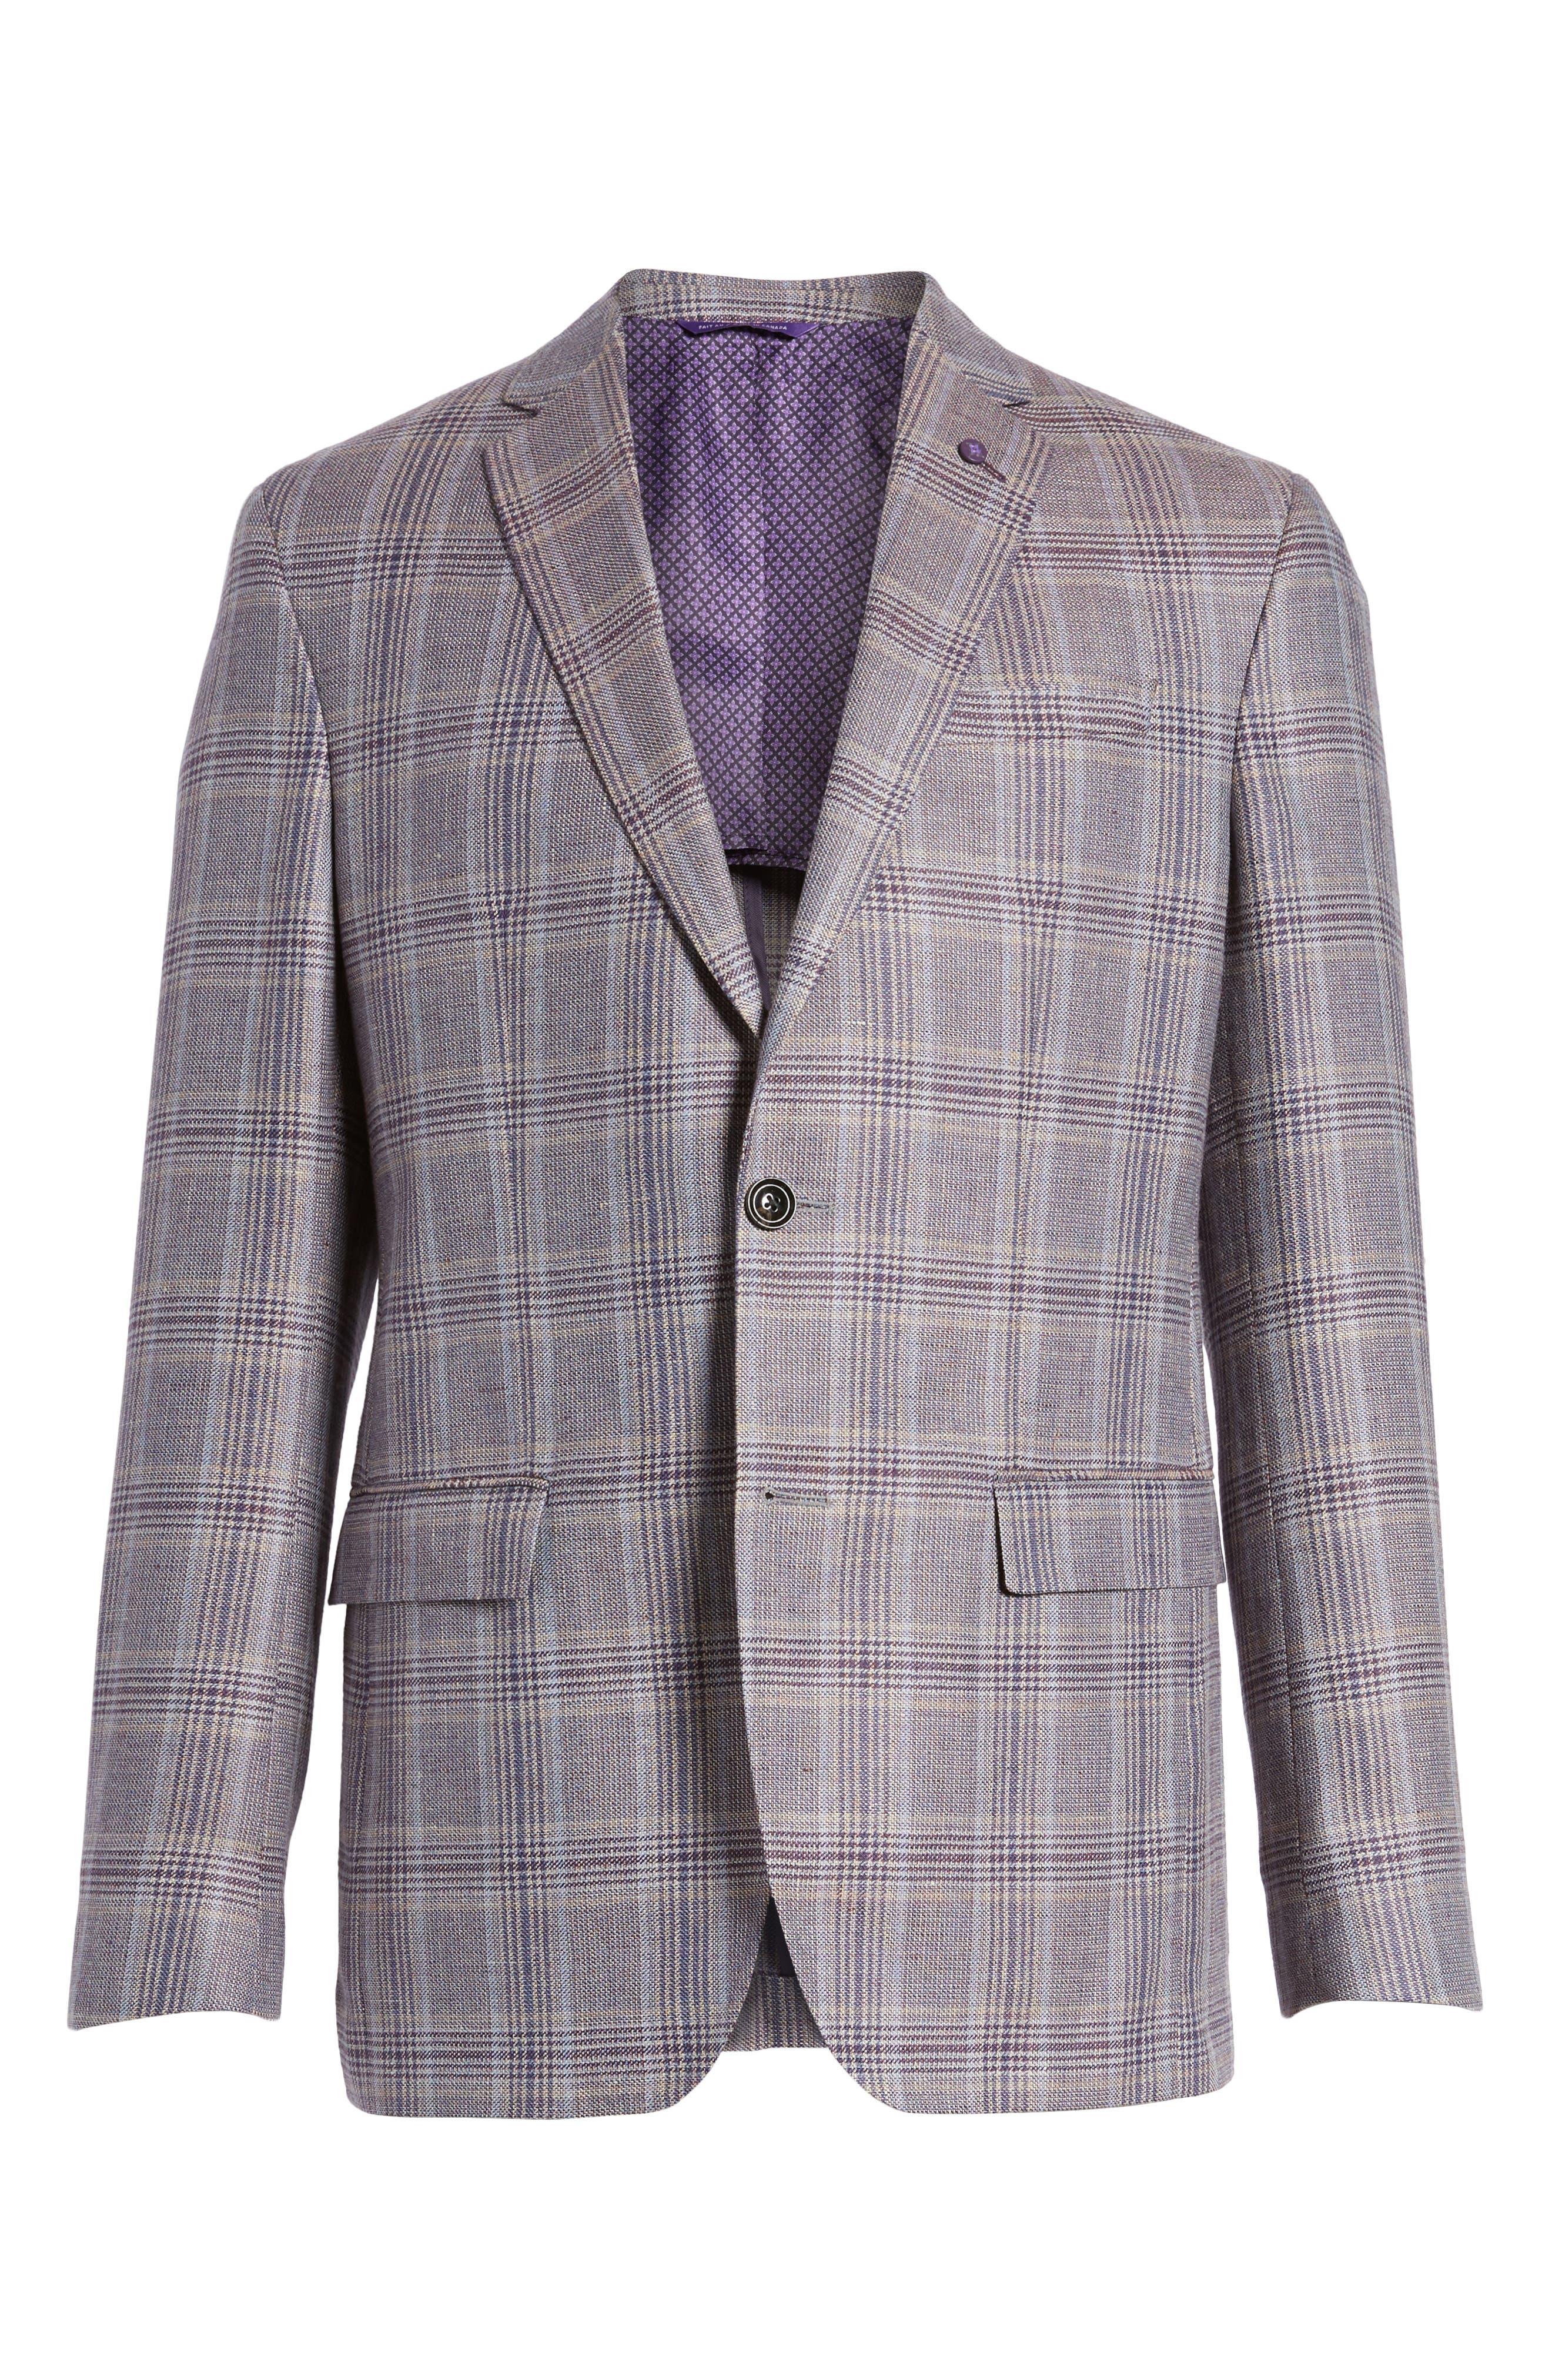 Konan Trim Fit Plaid Linen & Wool Sport Coat,                             Alternate thumbnail 7, color,                             Tan